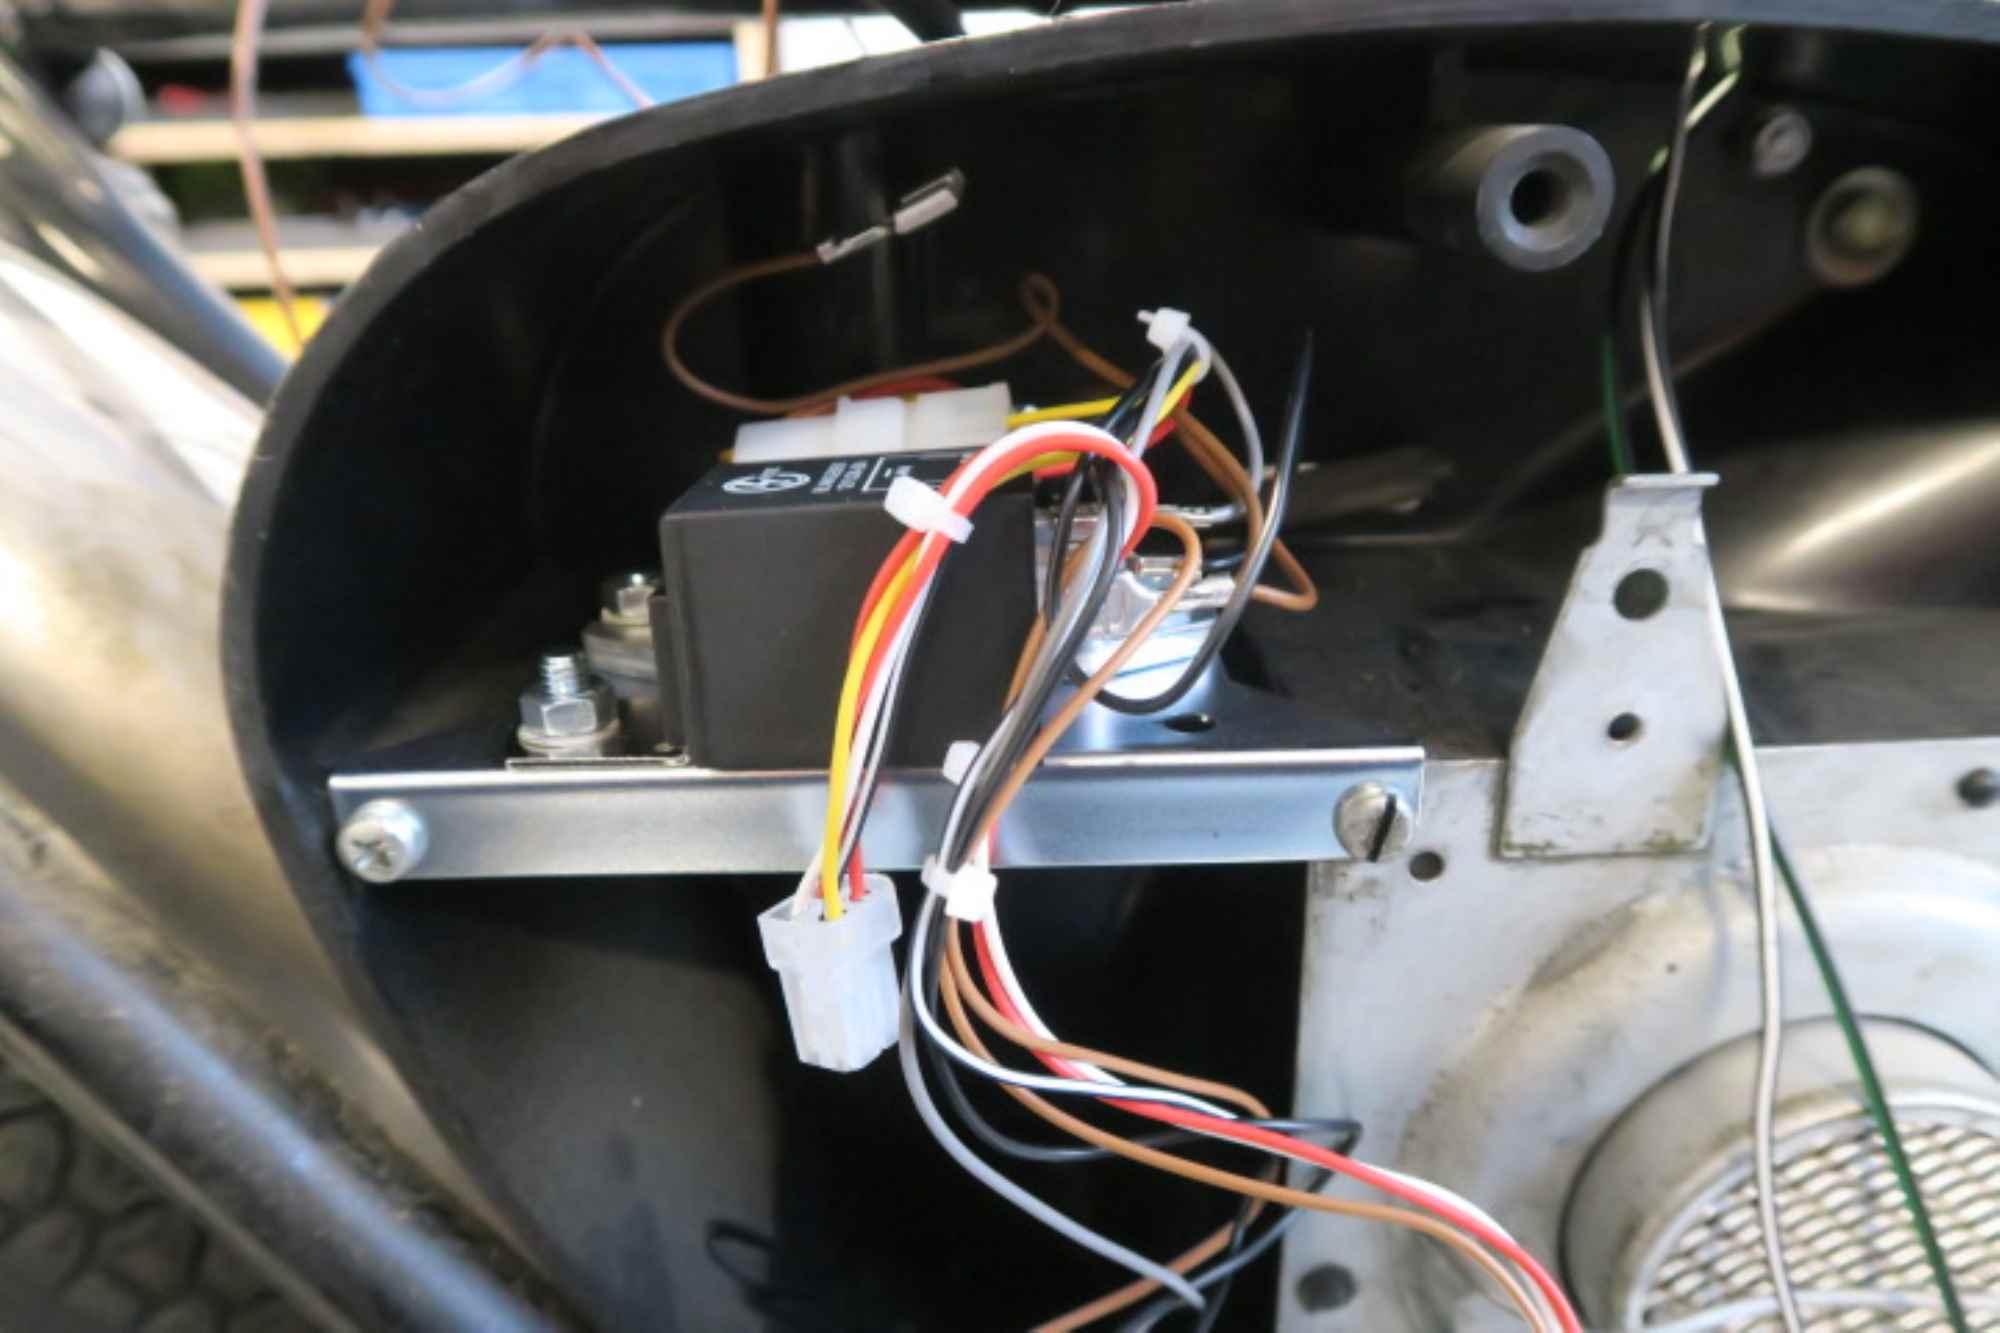 Blinkgeber und Regler Vape im Herzkasten Simson S51